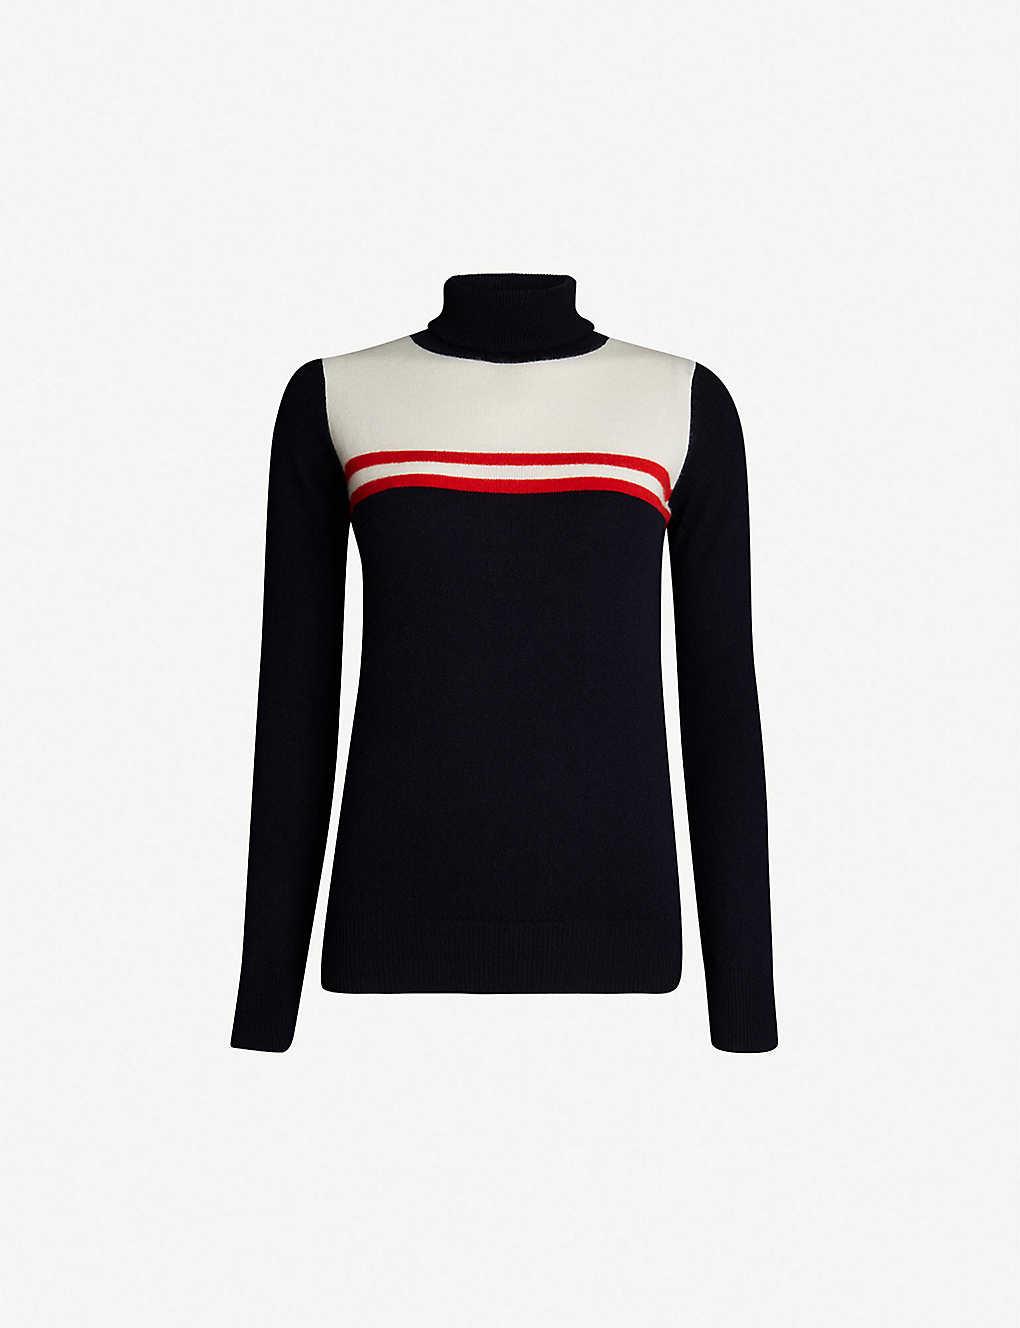 Madeleine Cashmere Turtleneck Sweater Eugenia Thompson xqqBf0wU7